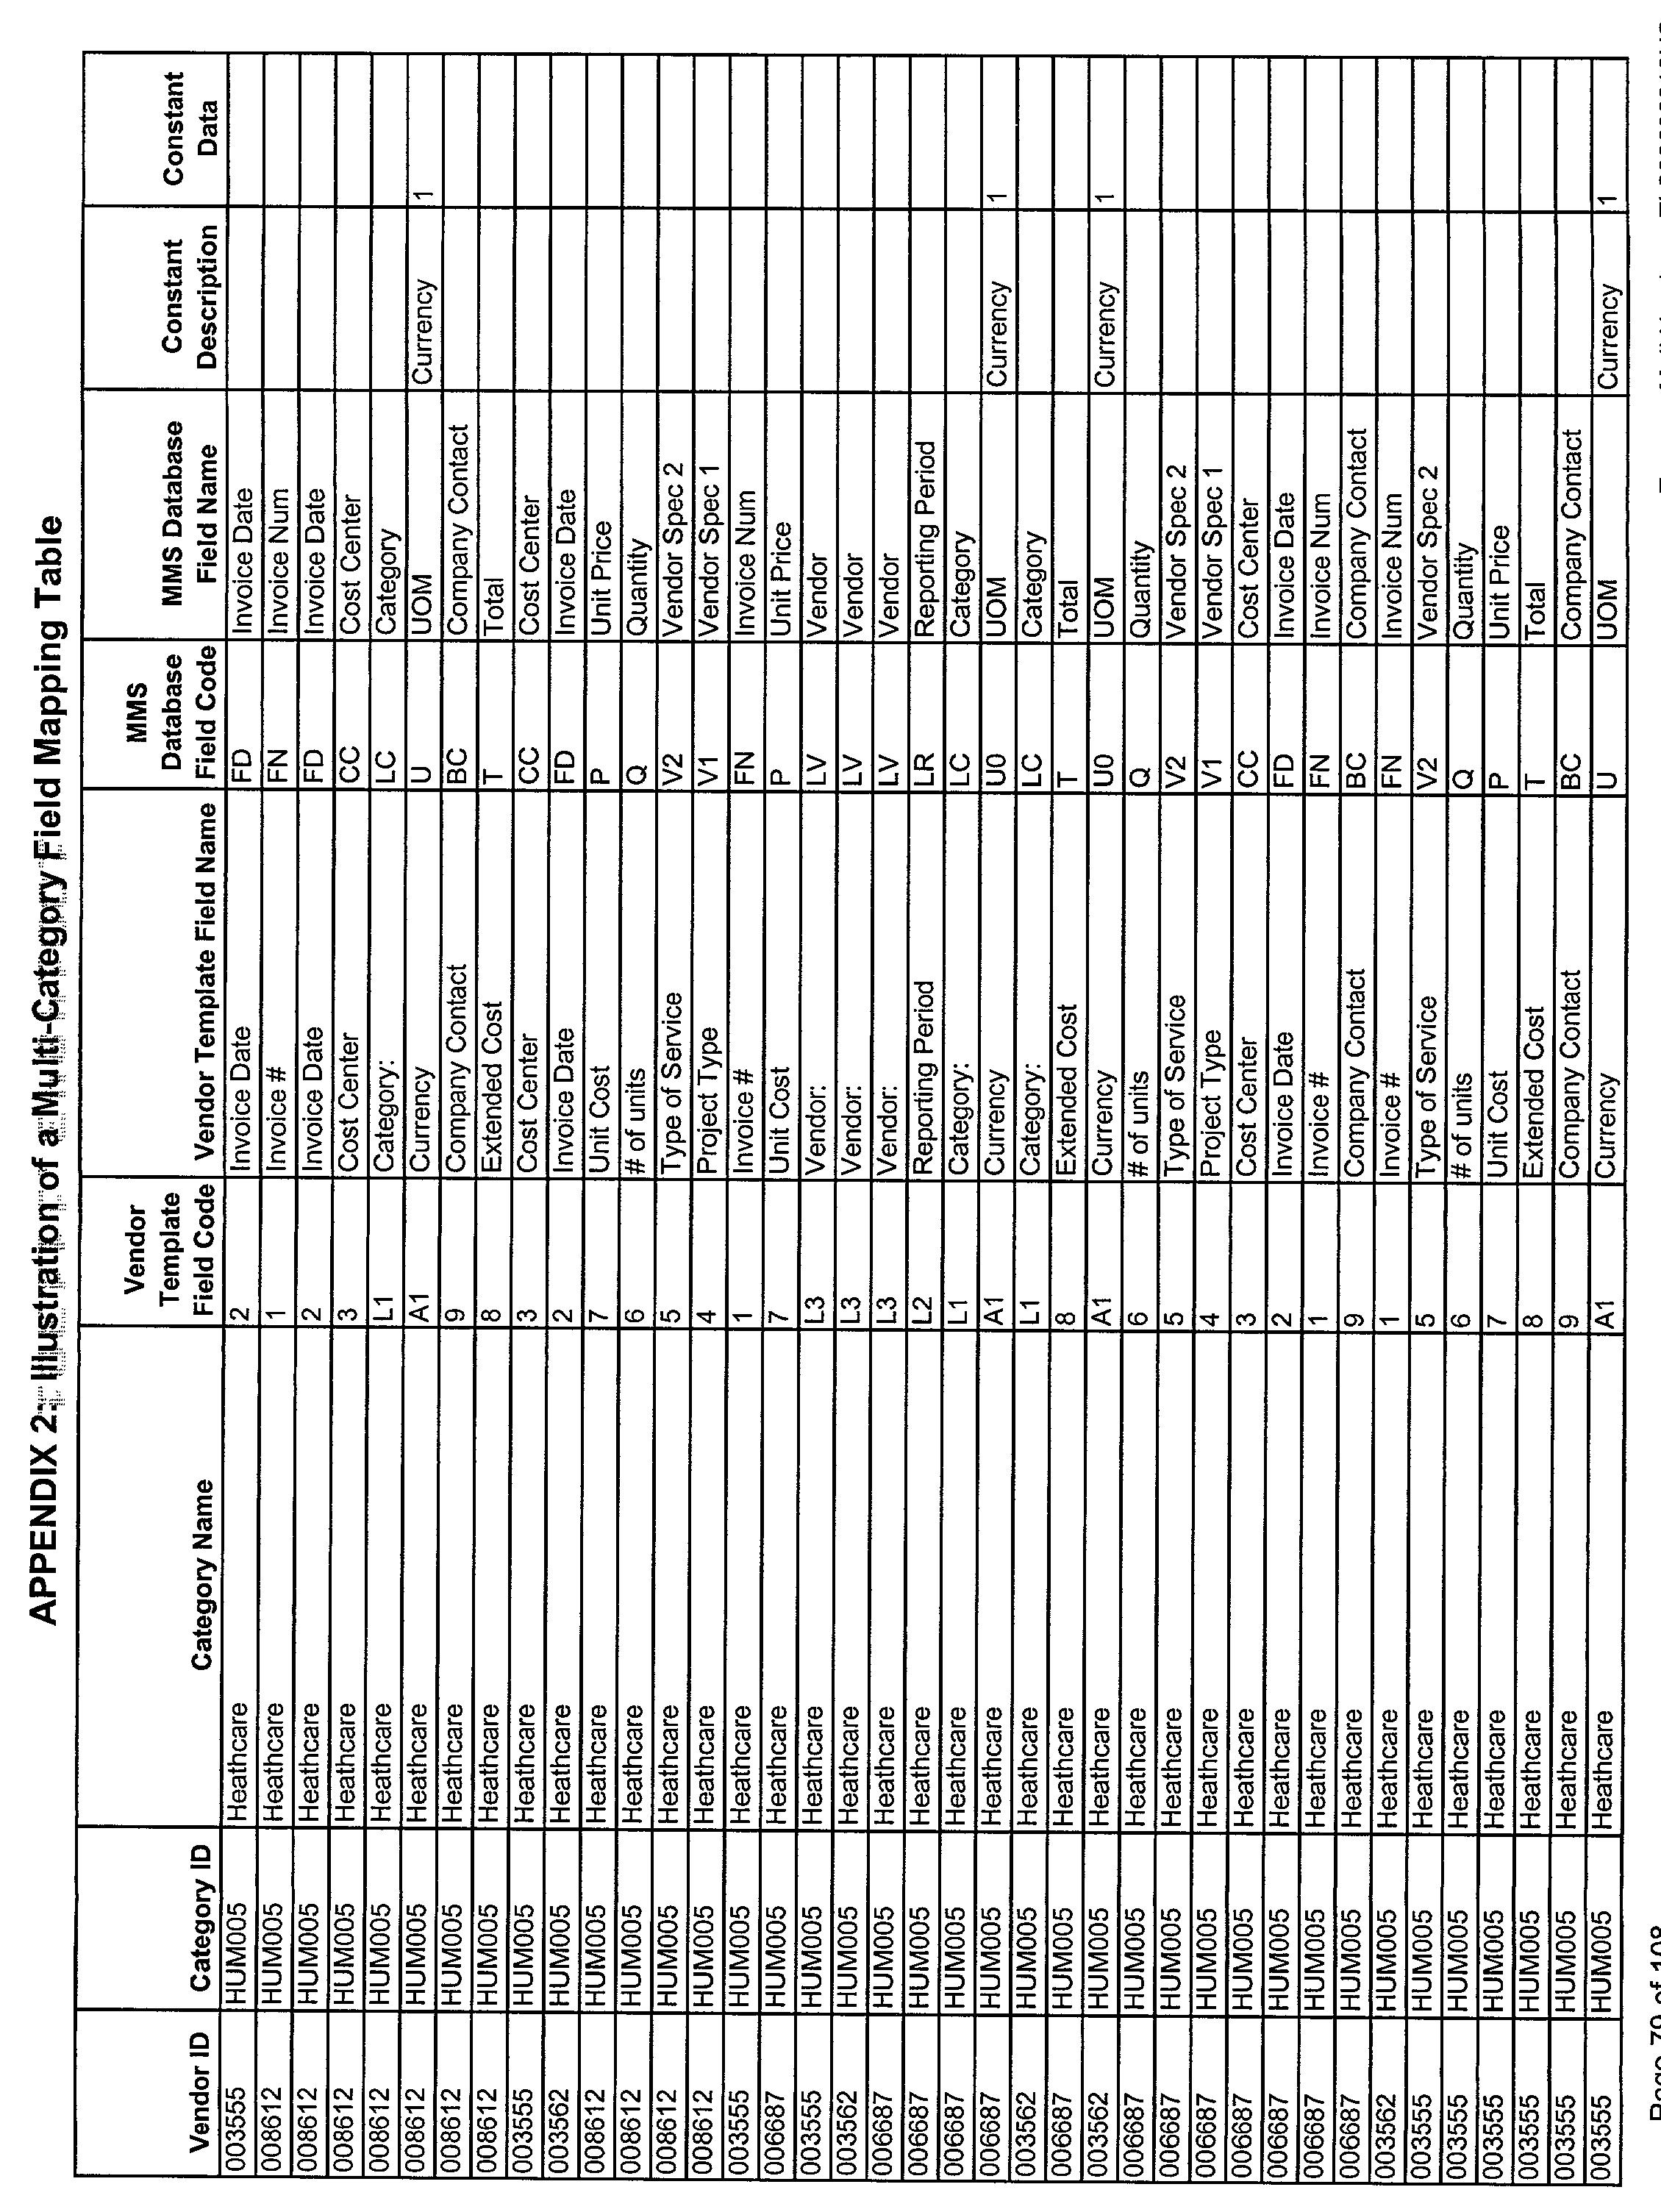 Figure US20020128938A1-20020912-P00020